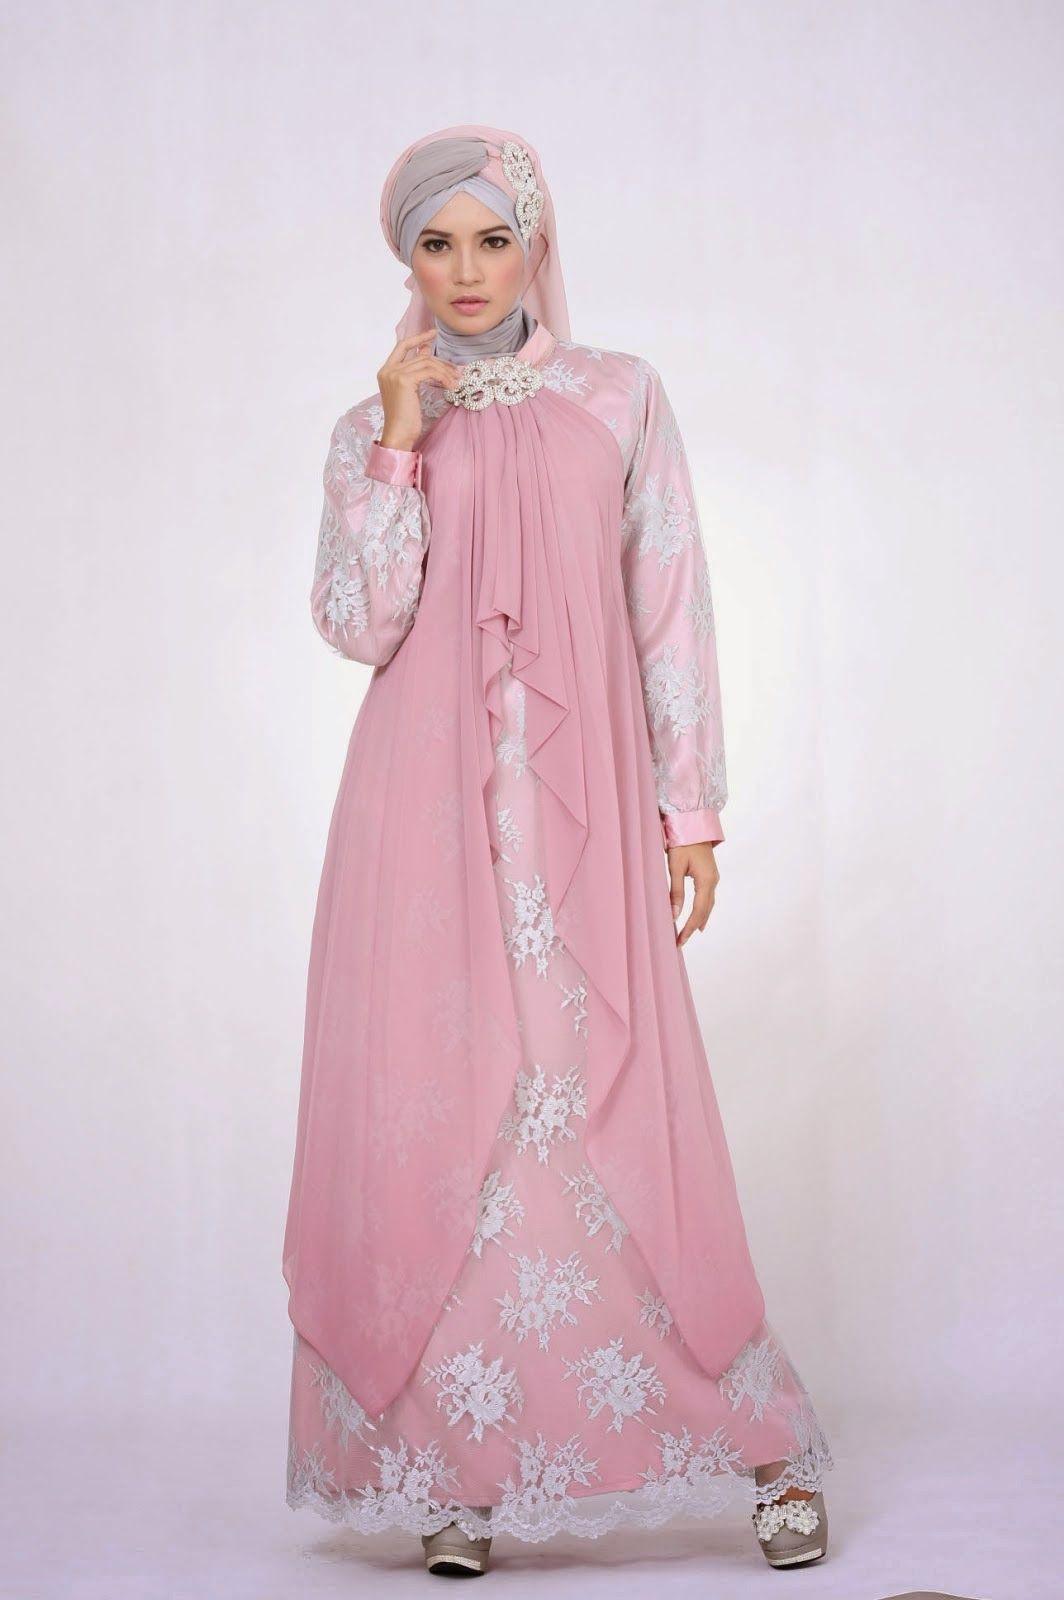 Butik Jeng Ita - Produk Busana dan Fashion Cantik Terbaru: Busana